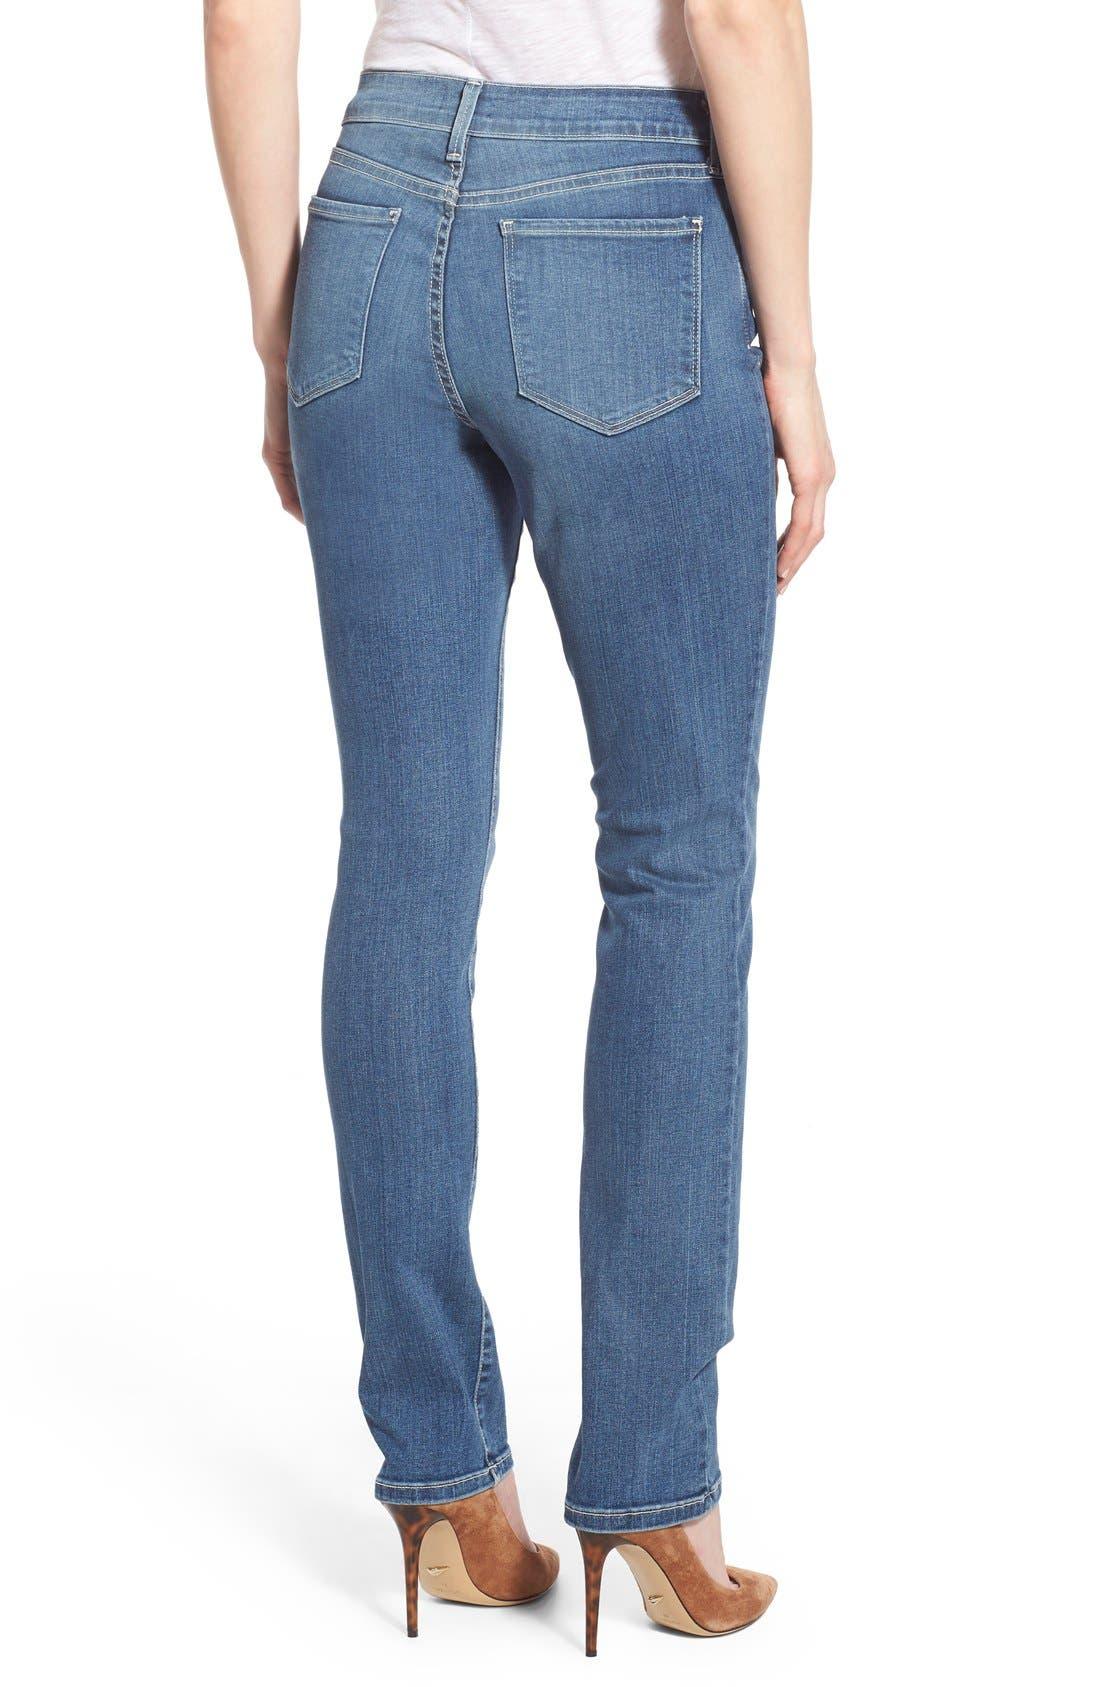 Alternate Image 2  - NYDJ 'Samantha' Stretch Slim Straight Leg Jeans (Heyburn) (Regular & Petite)